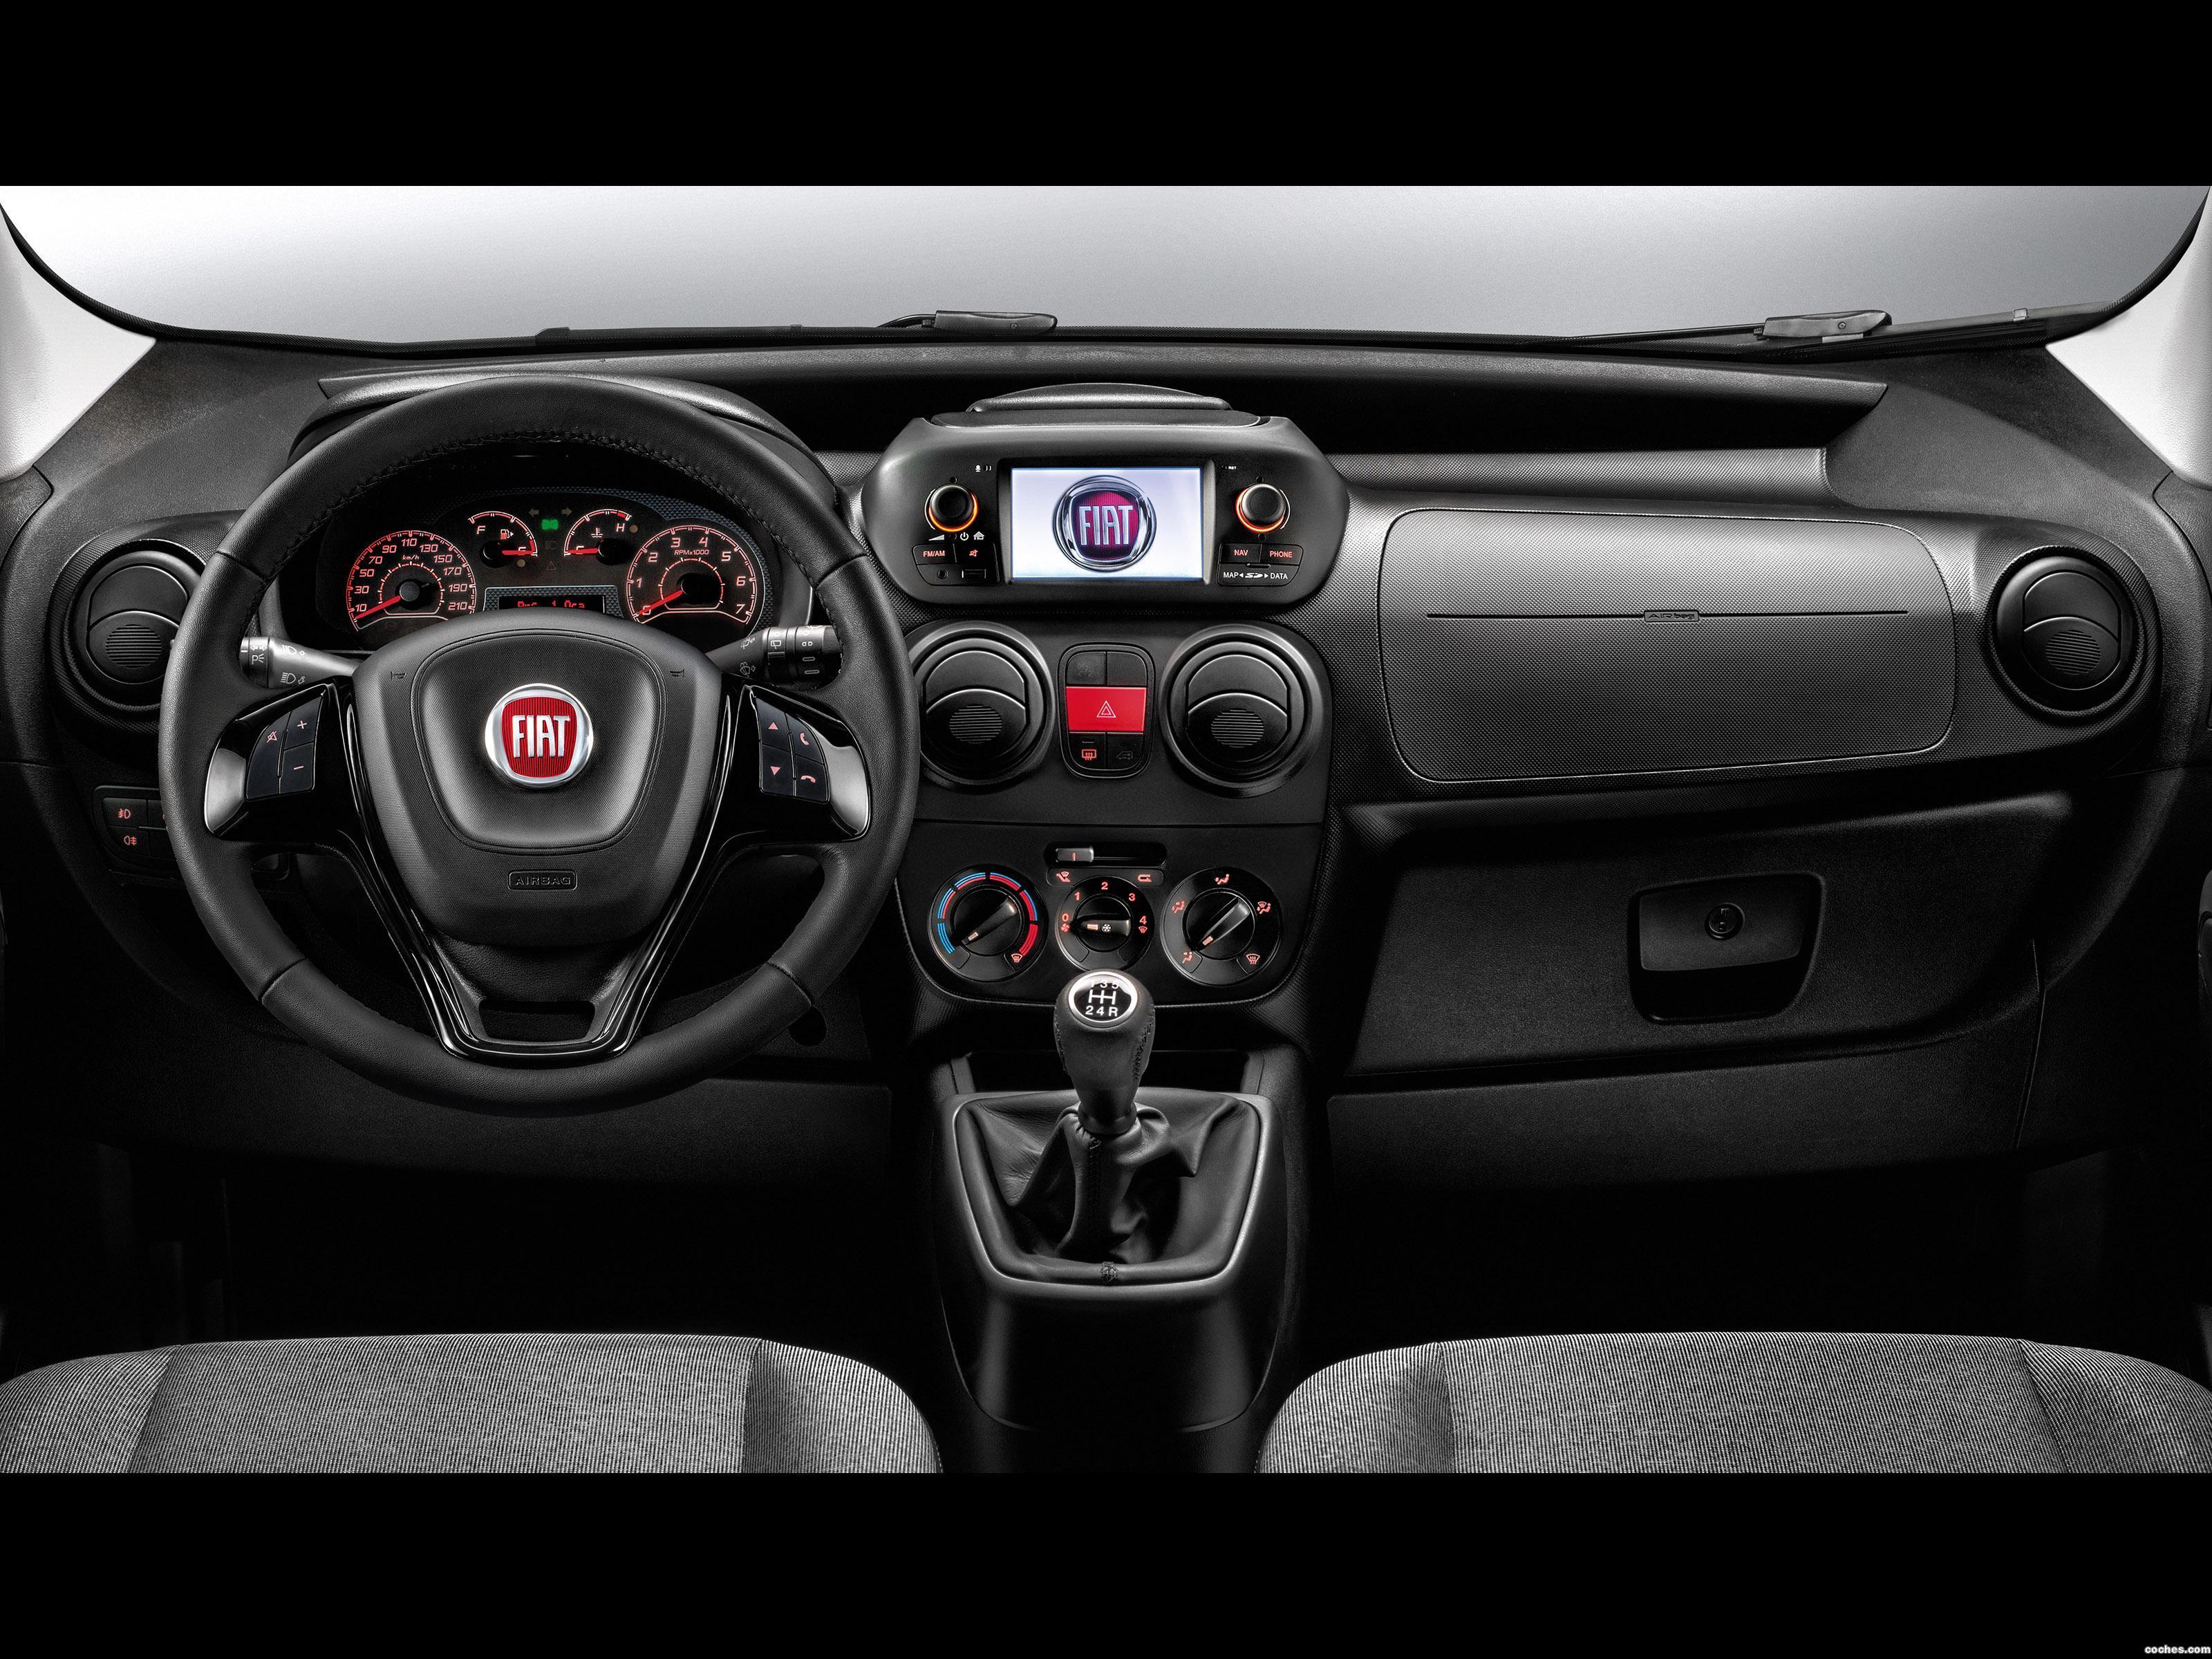 Foto 5 de Fiat Fiorino Comercial 2016